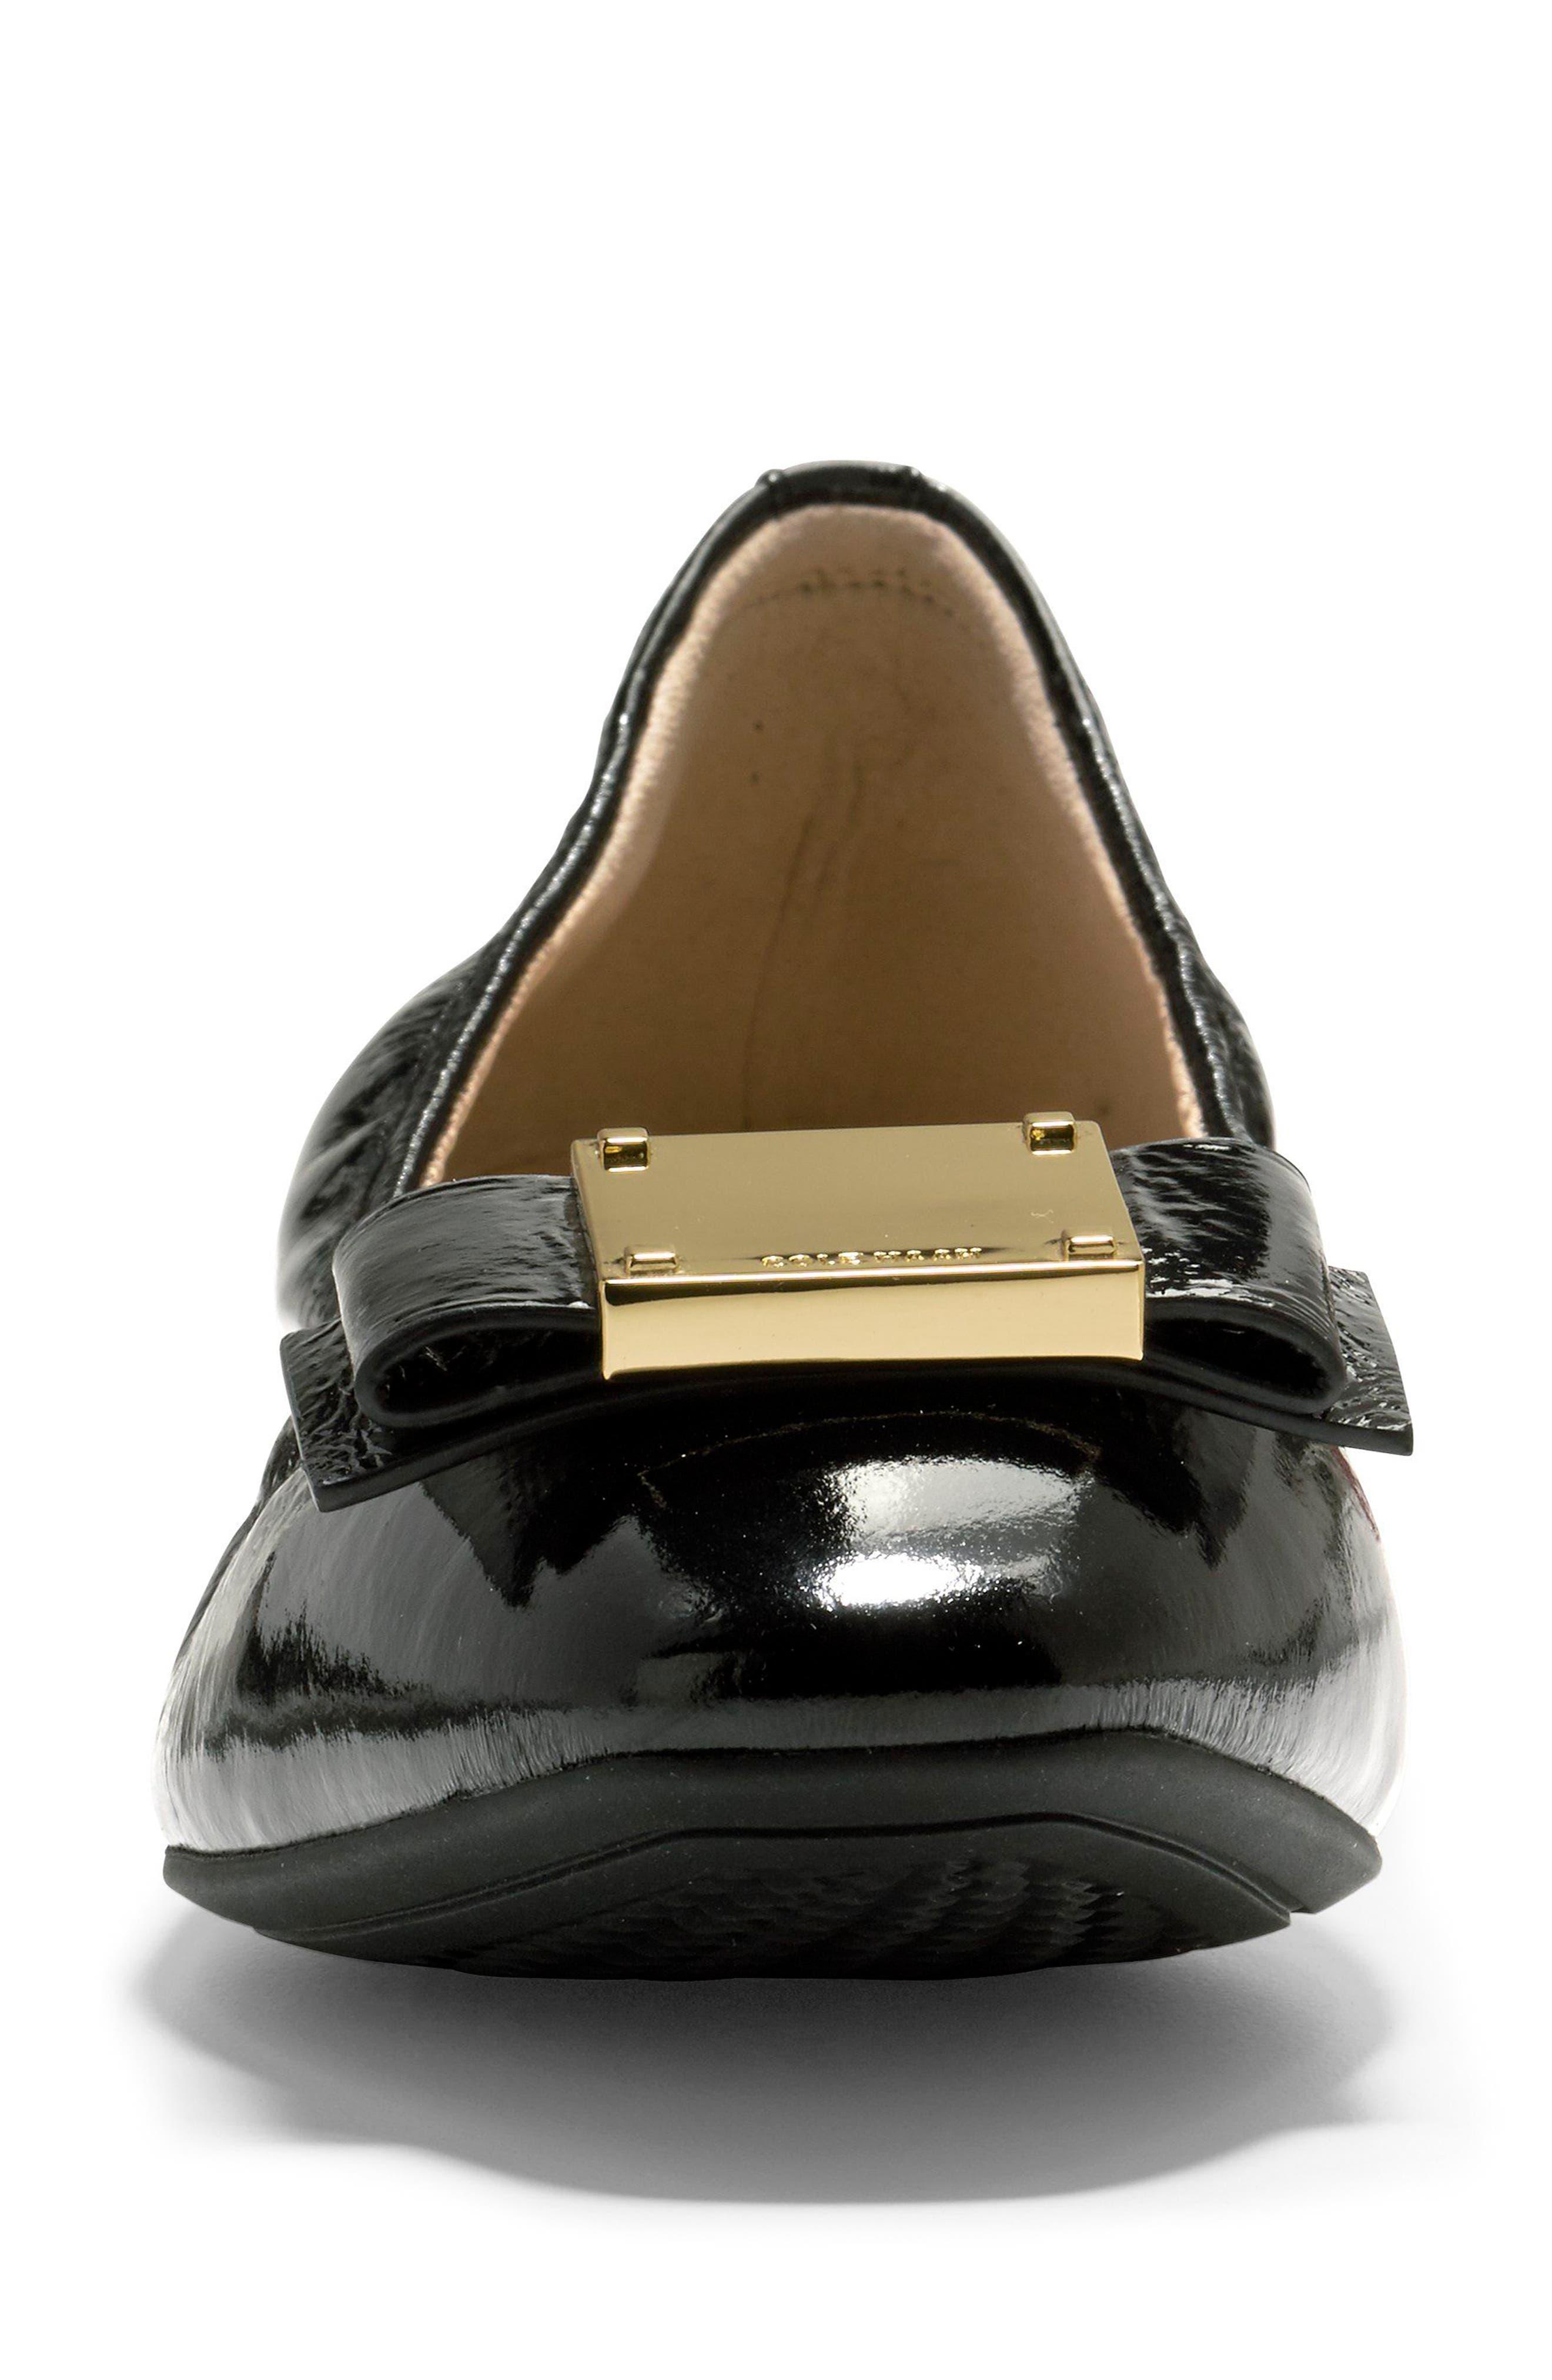 Tali Modern Bow Ballet Flat,                             Alternate thumbnail 4, color,                             Black Patent